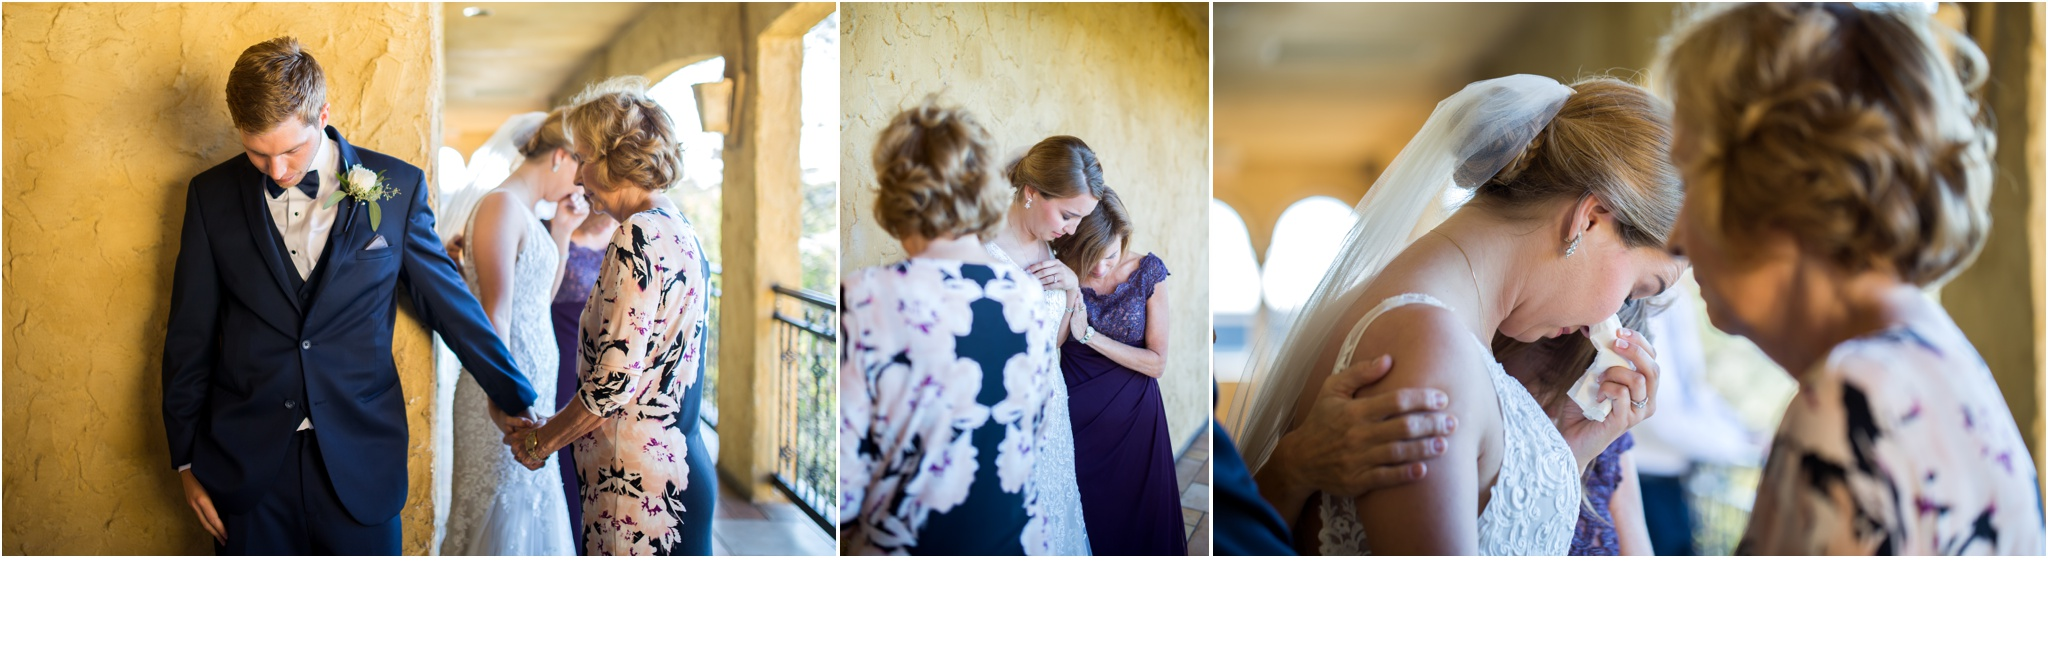 Rainey_Gregg_Photography_St._Simons_Island_Georgia_California_Wedding_Portrait_Photography_0640.jpg